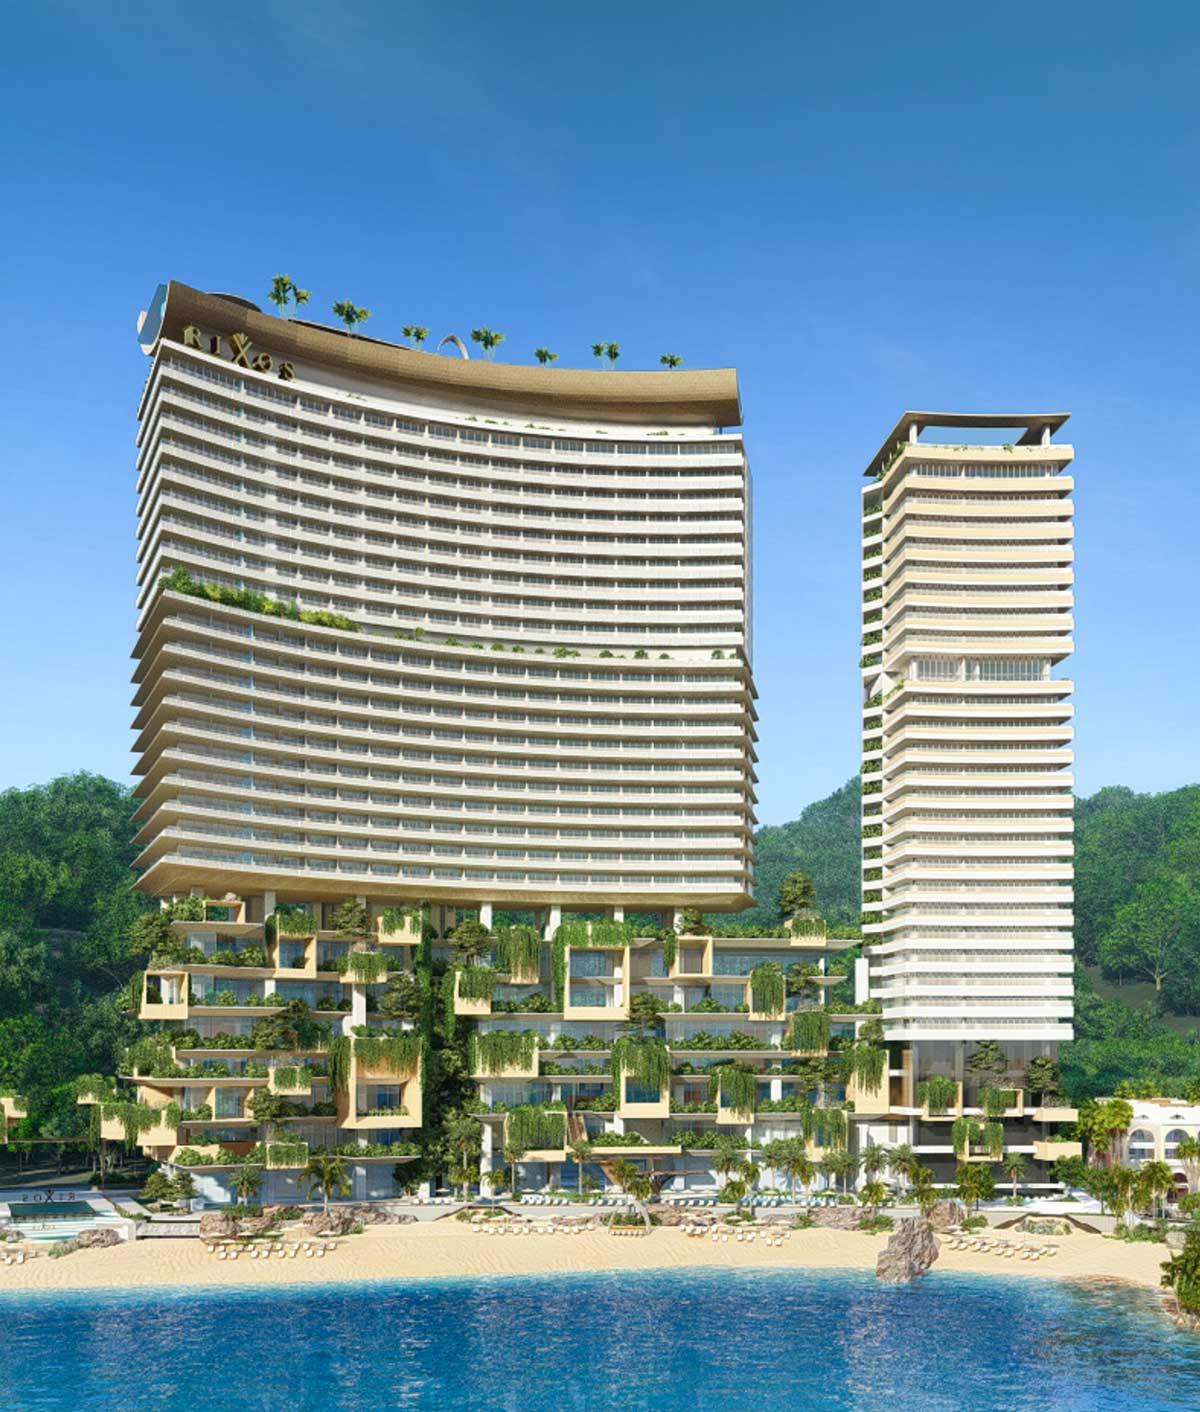 khu can ho condotel 5sao tai Vega City Nha Trang - Vega City Nha Trang